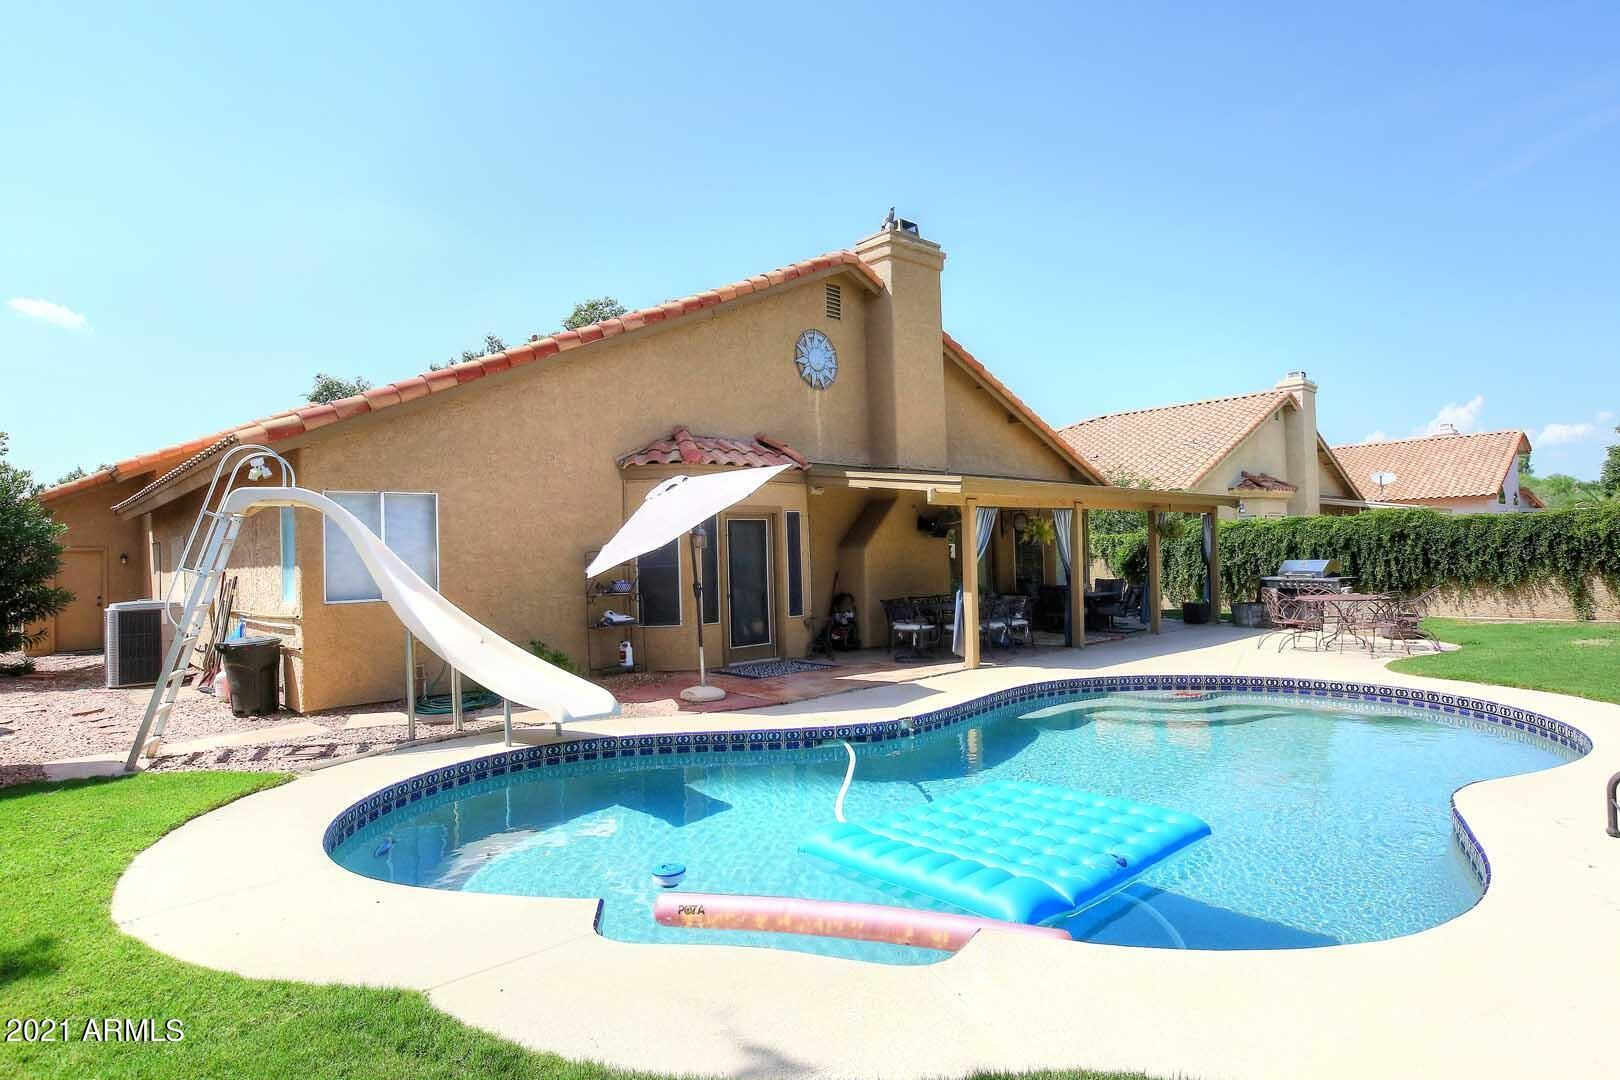 12095 N 91ST Way, Scottsdale, AZ 85260 - MLS#: 6289804